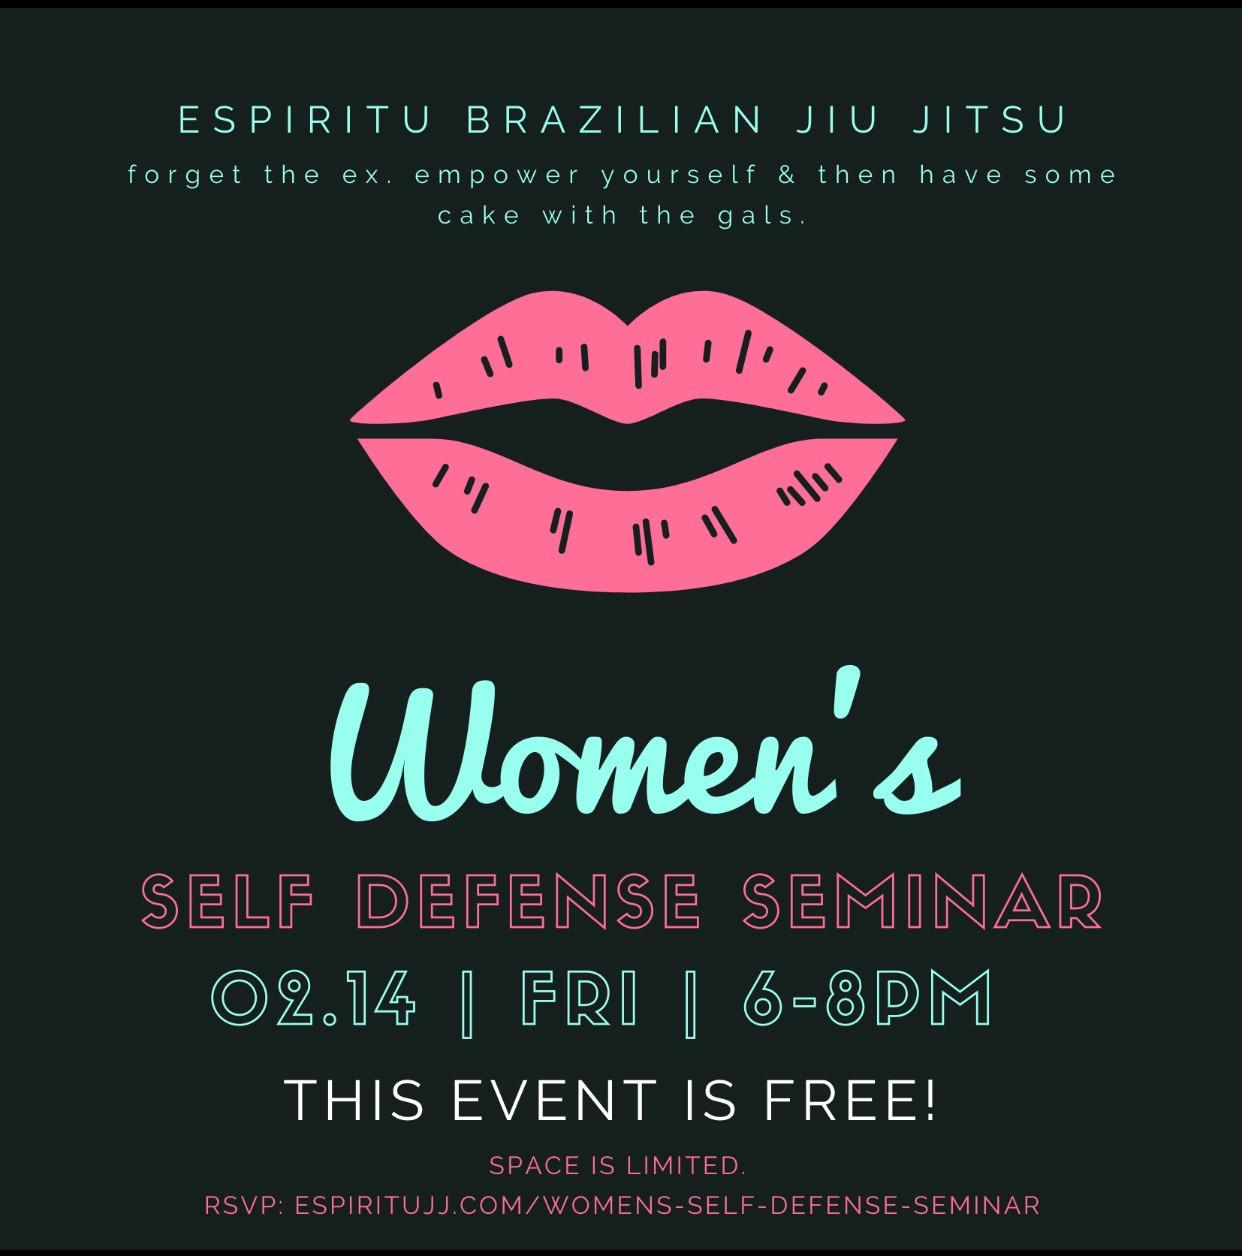 Brazilian Jiu Jitsu Women's Self Defense Seminar